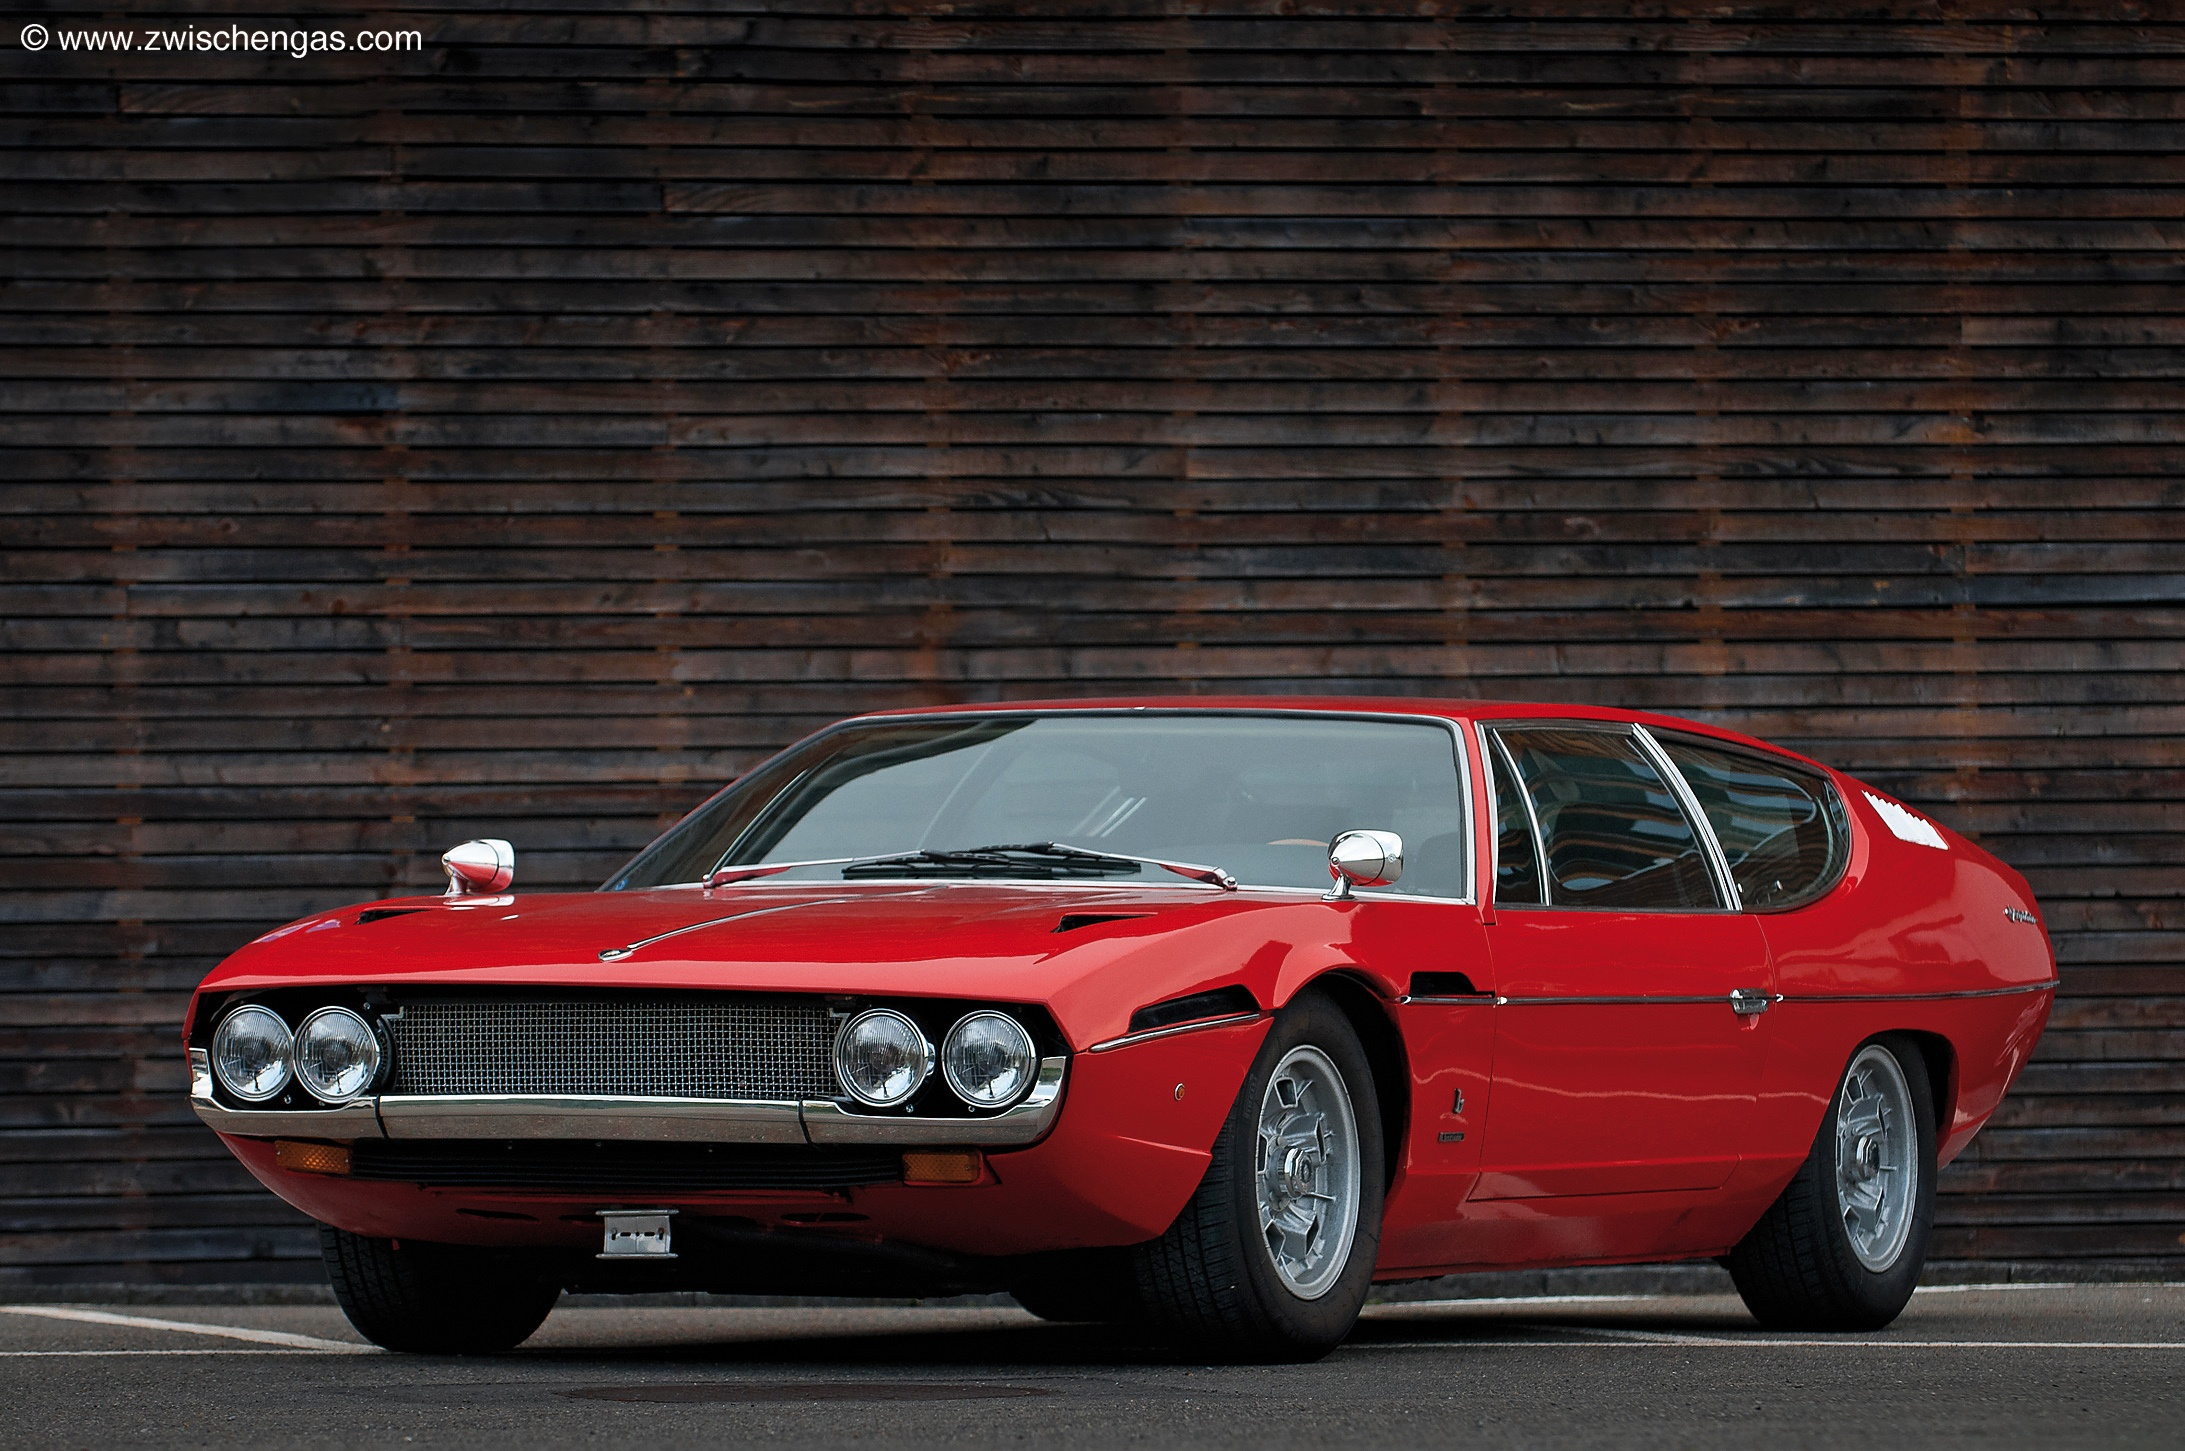 http://carsot.com/images/lamborghini-espada-1968-1981-coupe-exterior-2.jpg